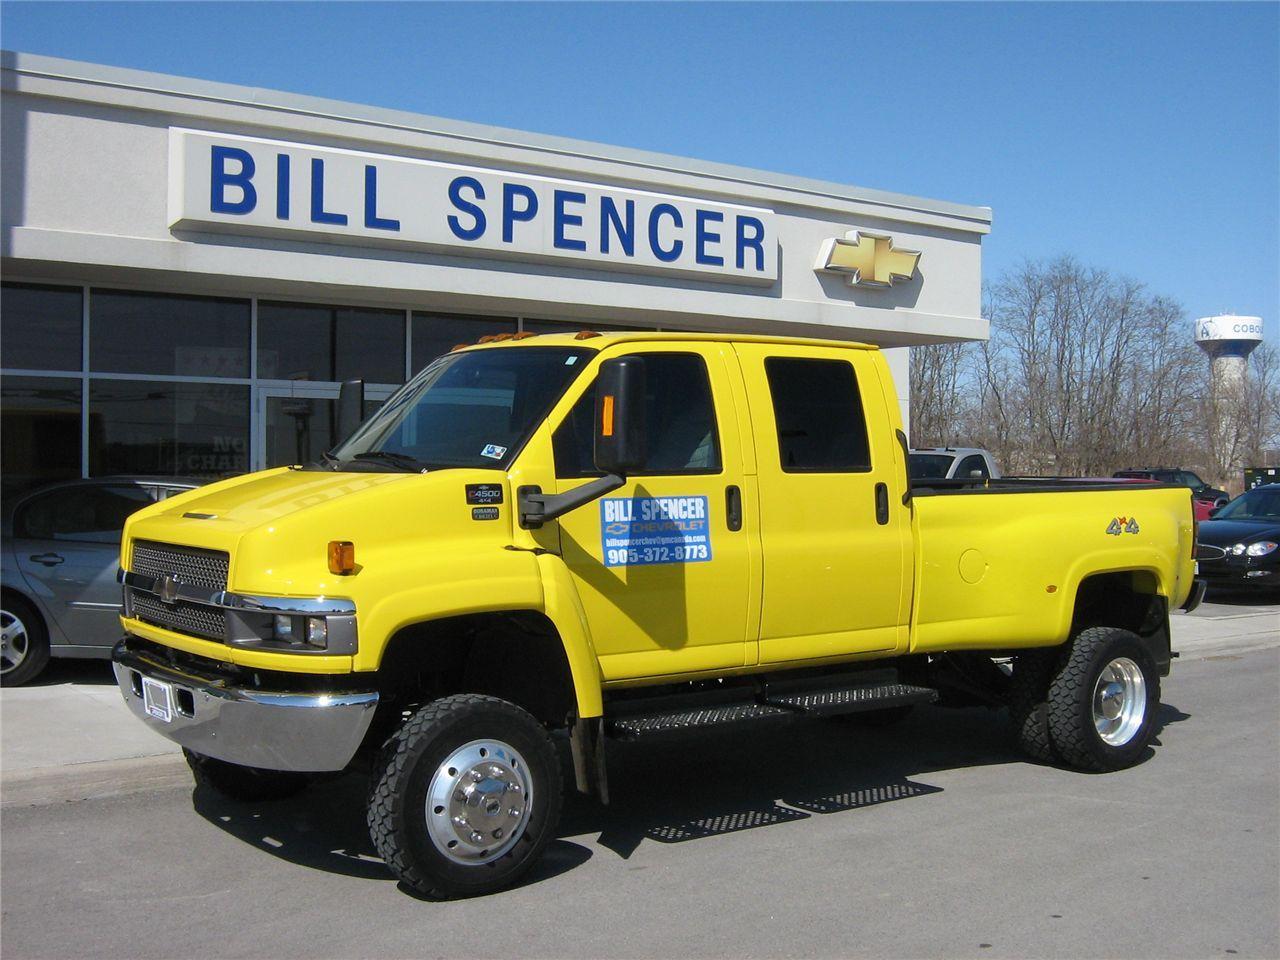 Chevy Topkick Truck Chevrolet Kodiak C4500 Pickup Pick Up American Naiaza Say Trucks Big Trucks Single Cab Trucks